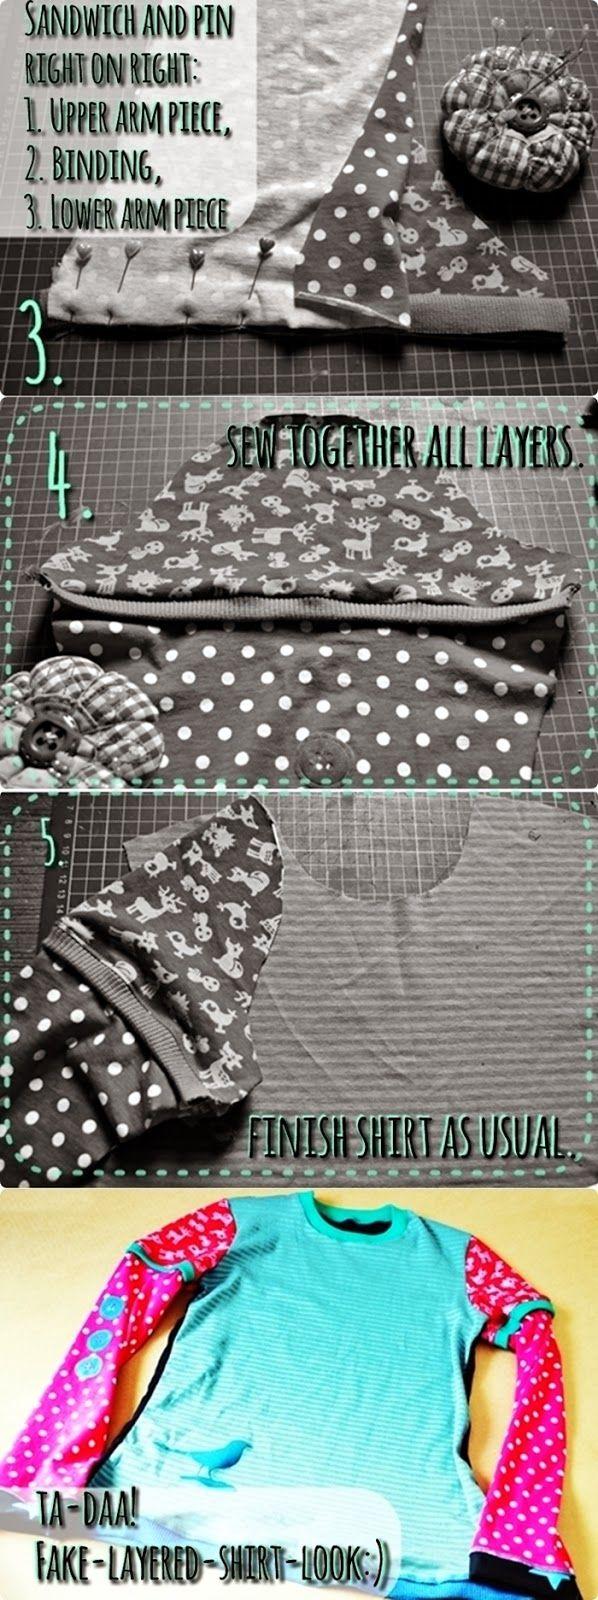 bienvenido colorido mini tutorial lagenlook ge faked sewing tutorial n hen diy n hen und. Black Bedroom Furniture Sets. Home Design Ideas